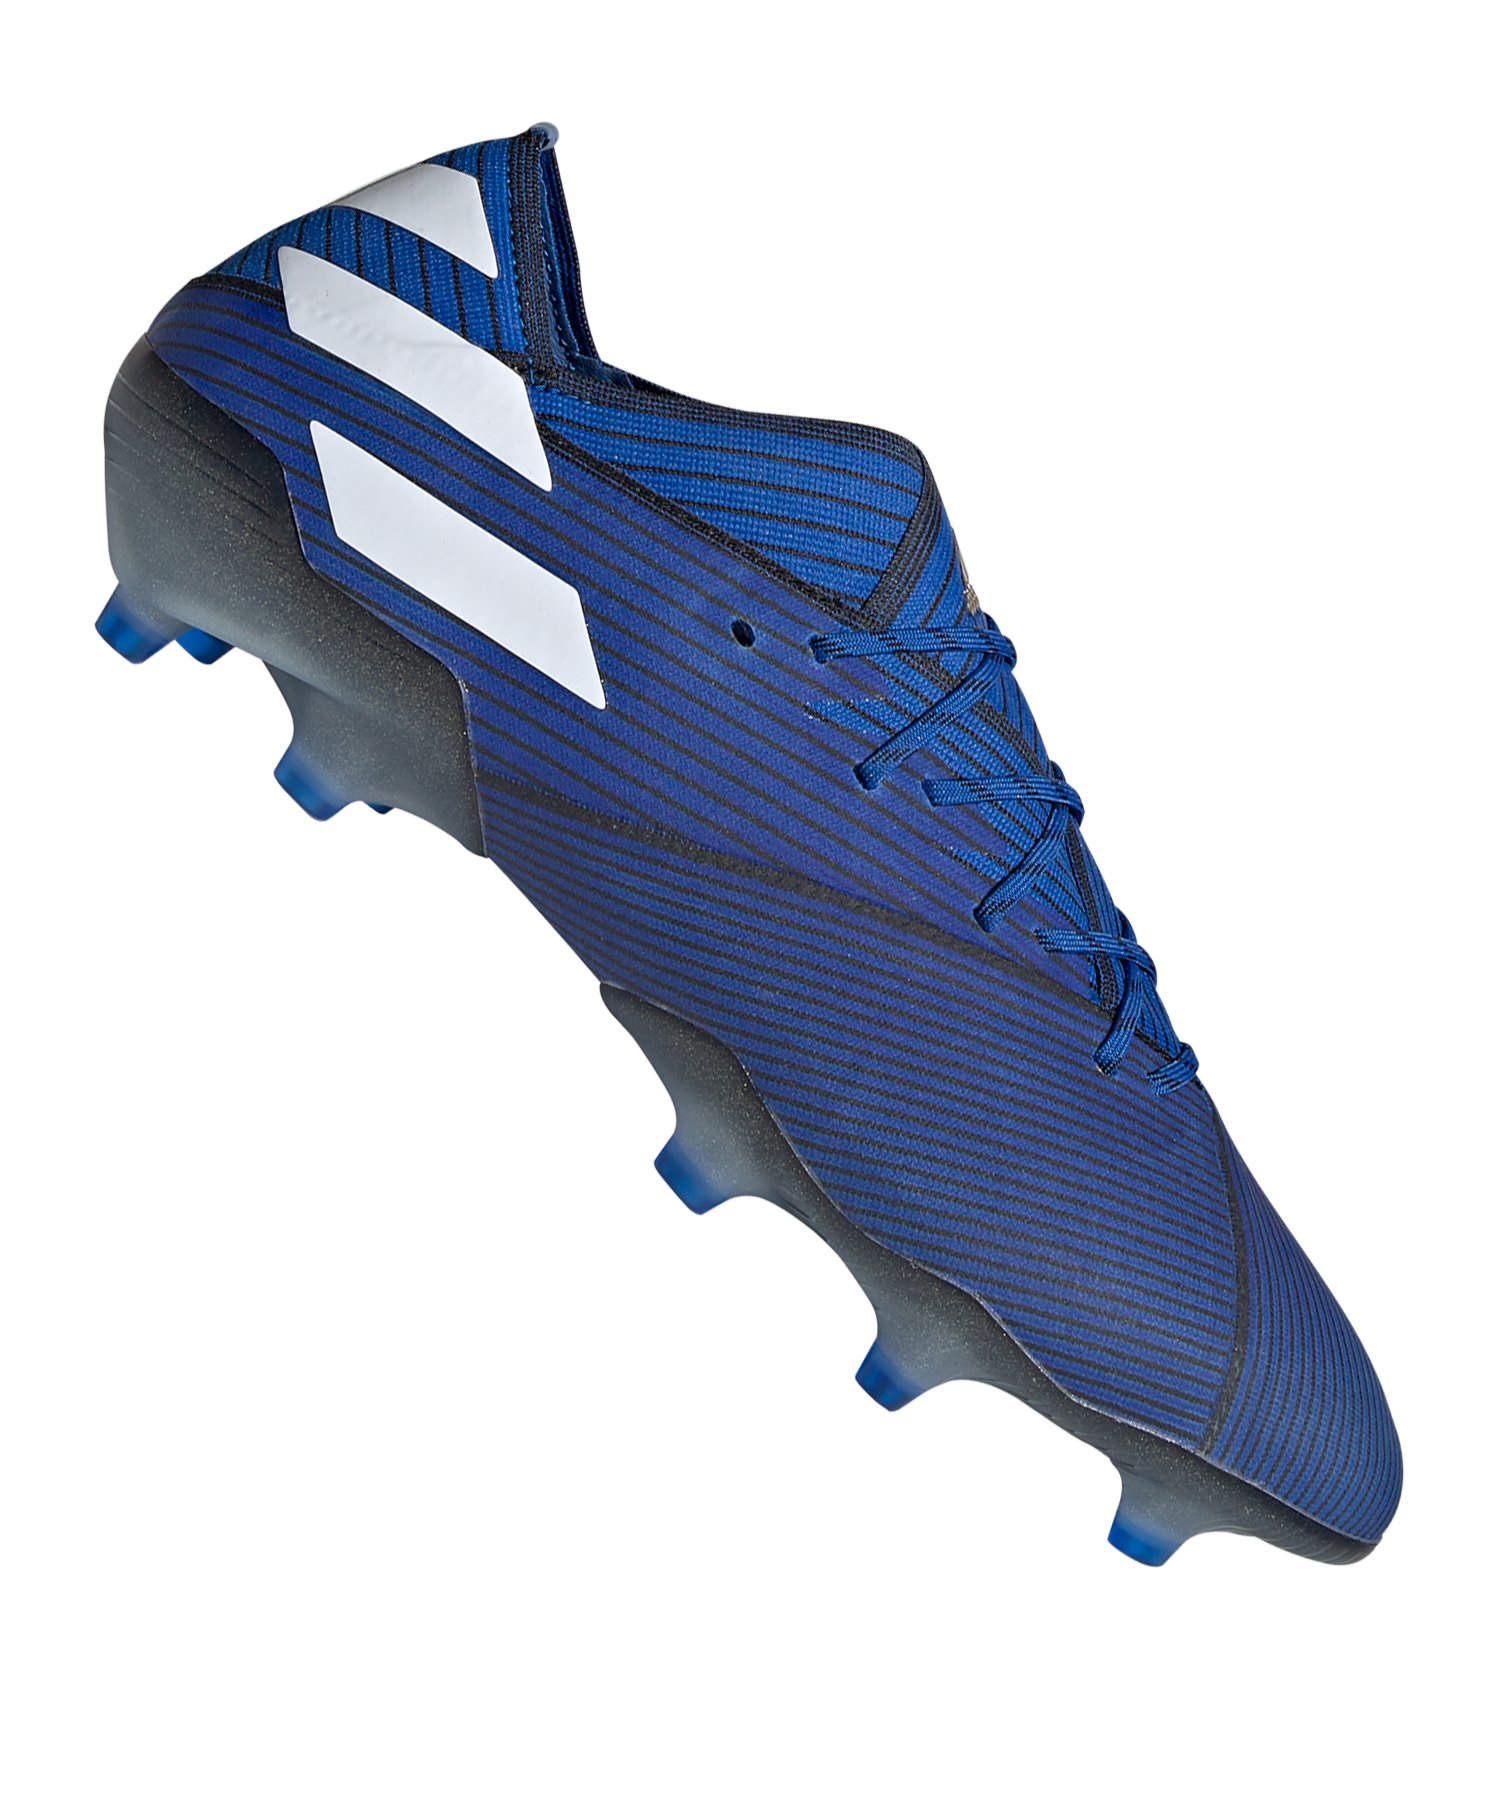 adidas NEMEZIZ 19.1 FG Blau Schwarz - Blau